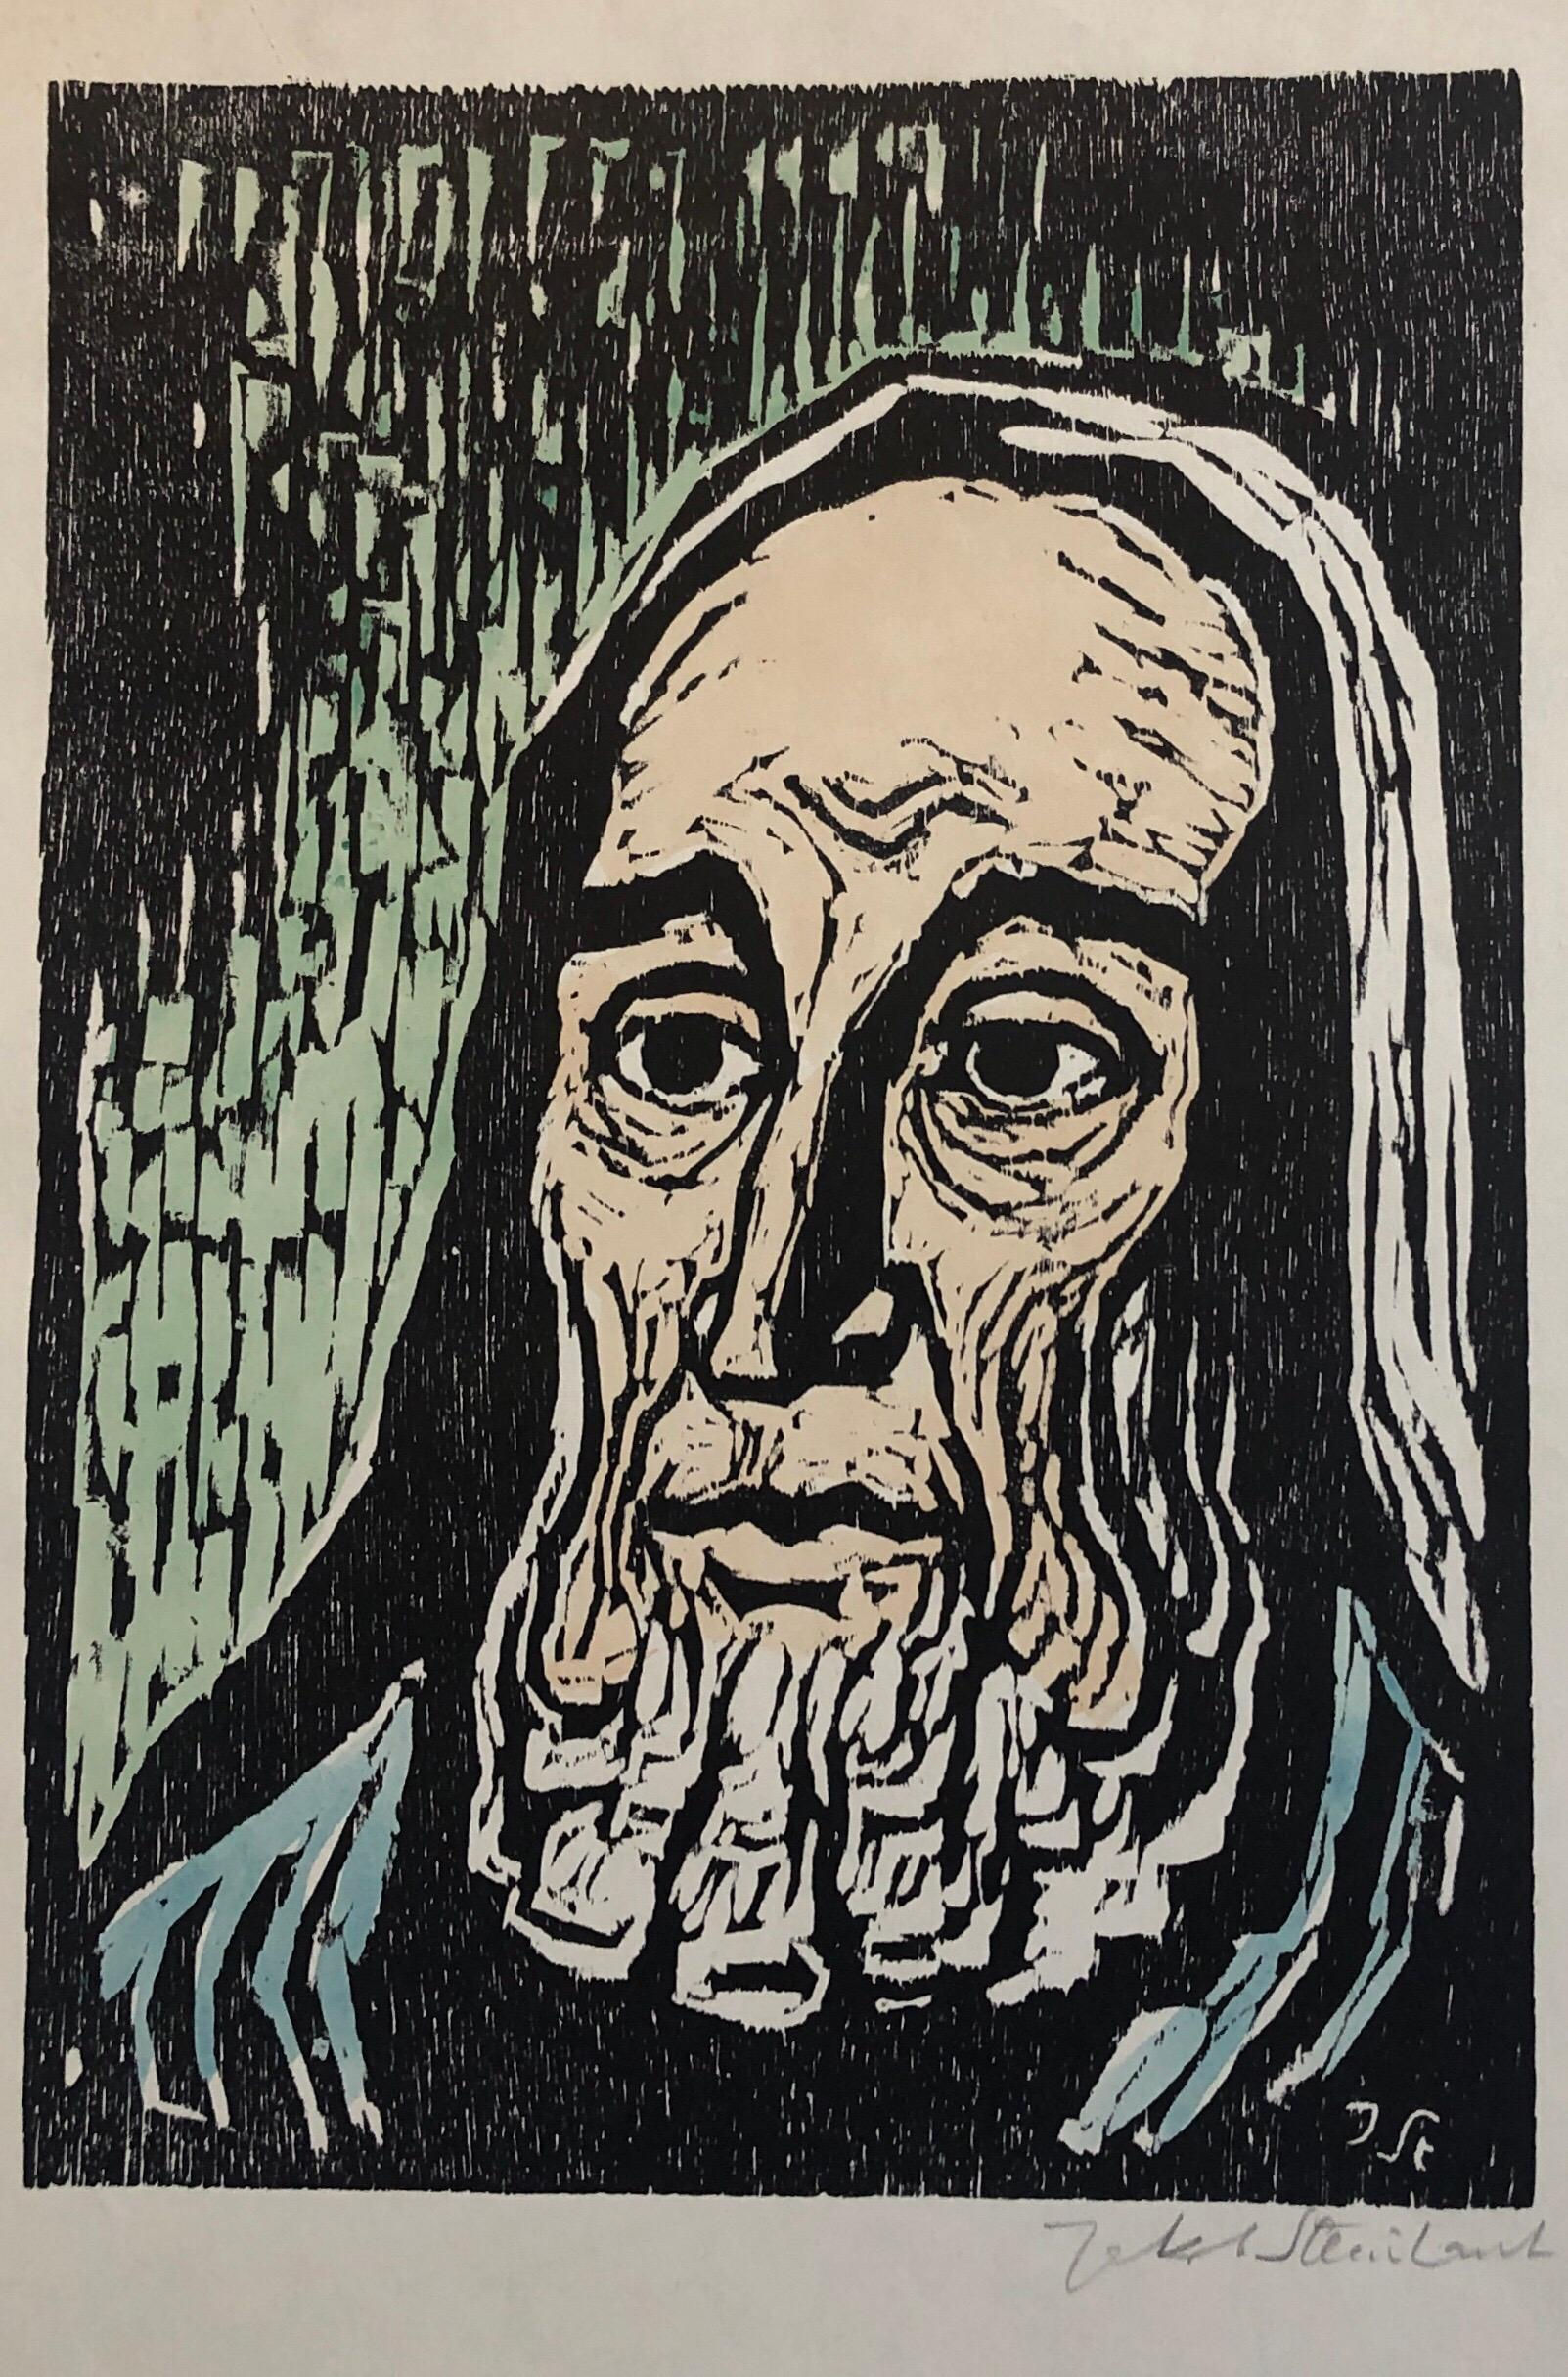 Jewish Prophet Rabbi German Expressionist Color Woodcut Israeli Early Bezalel